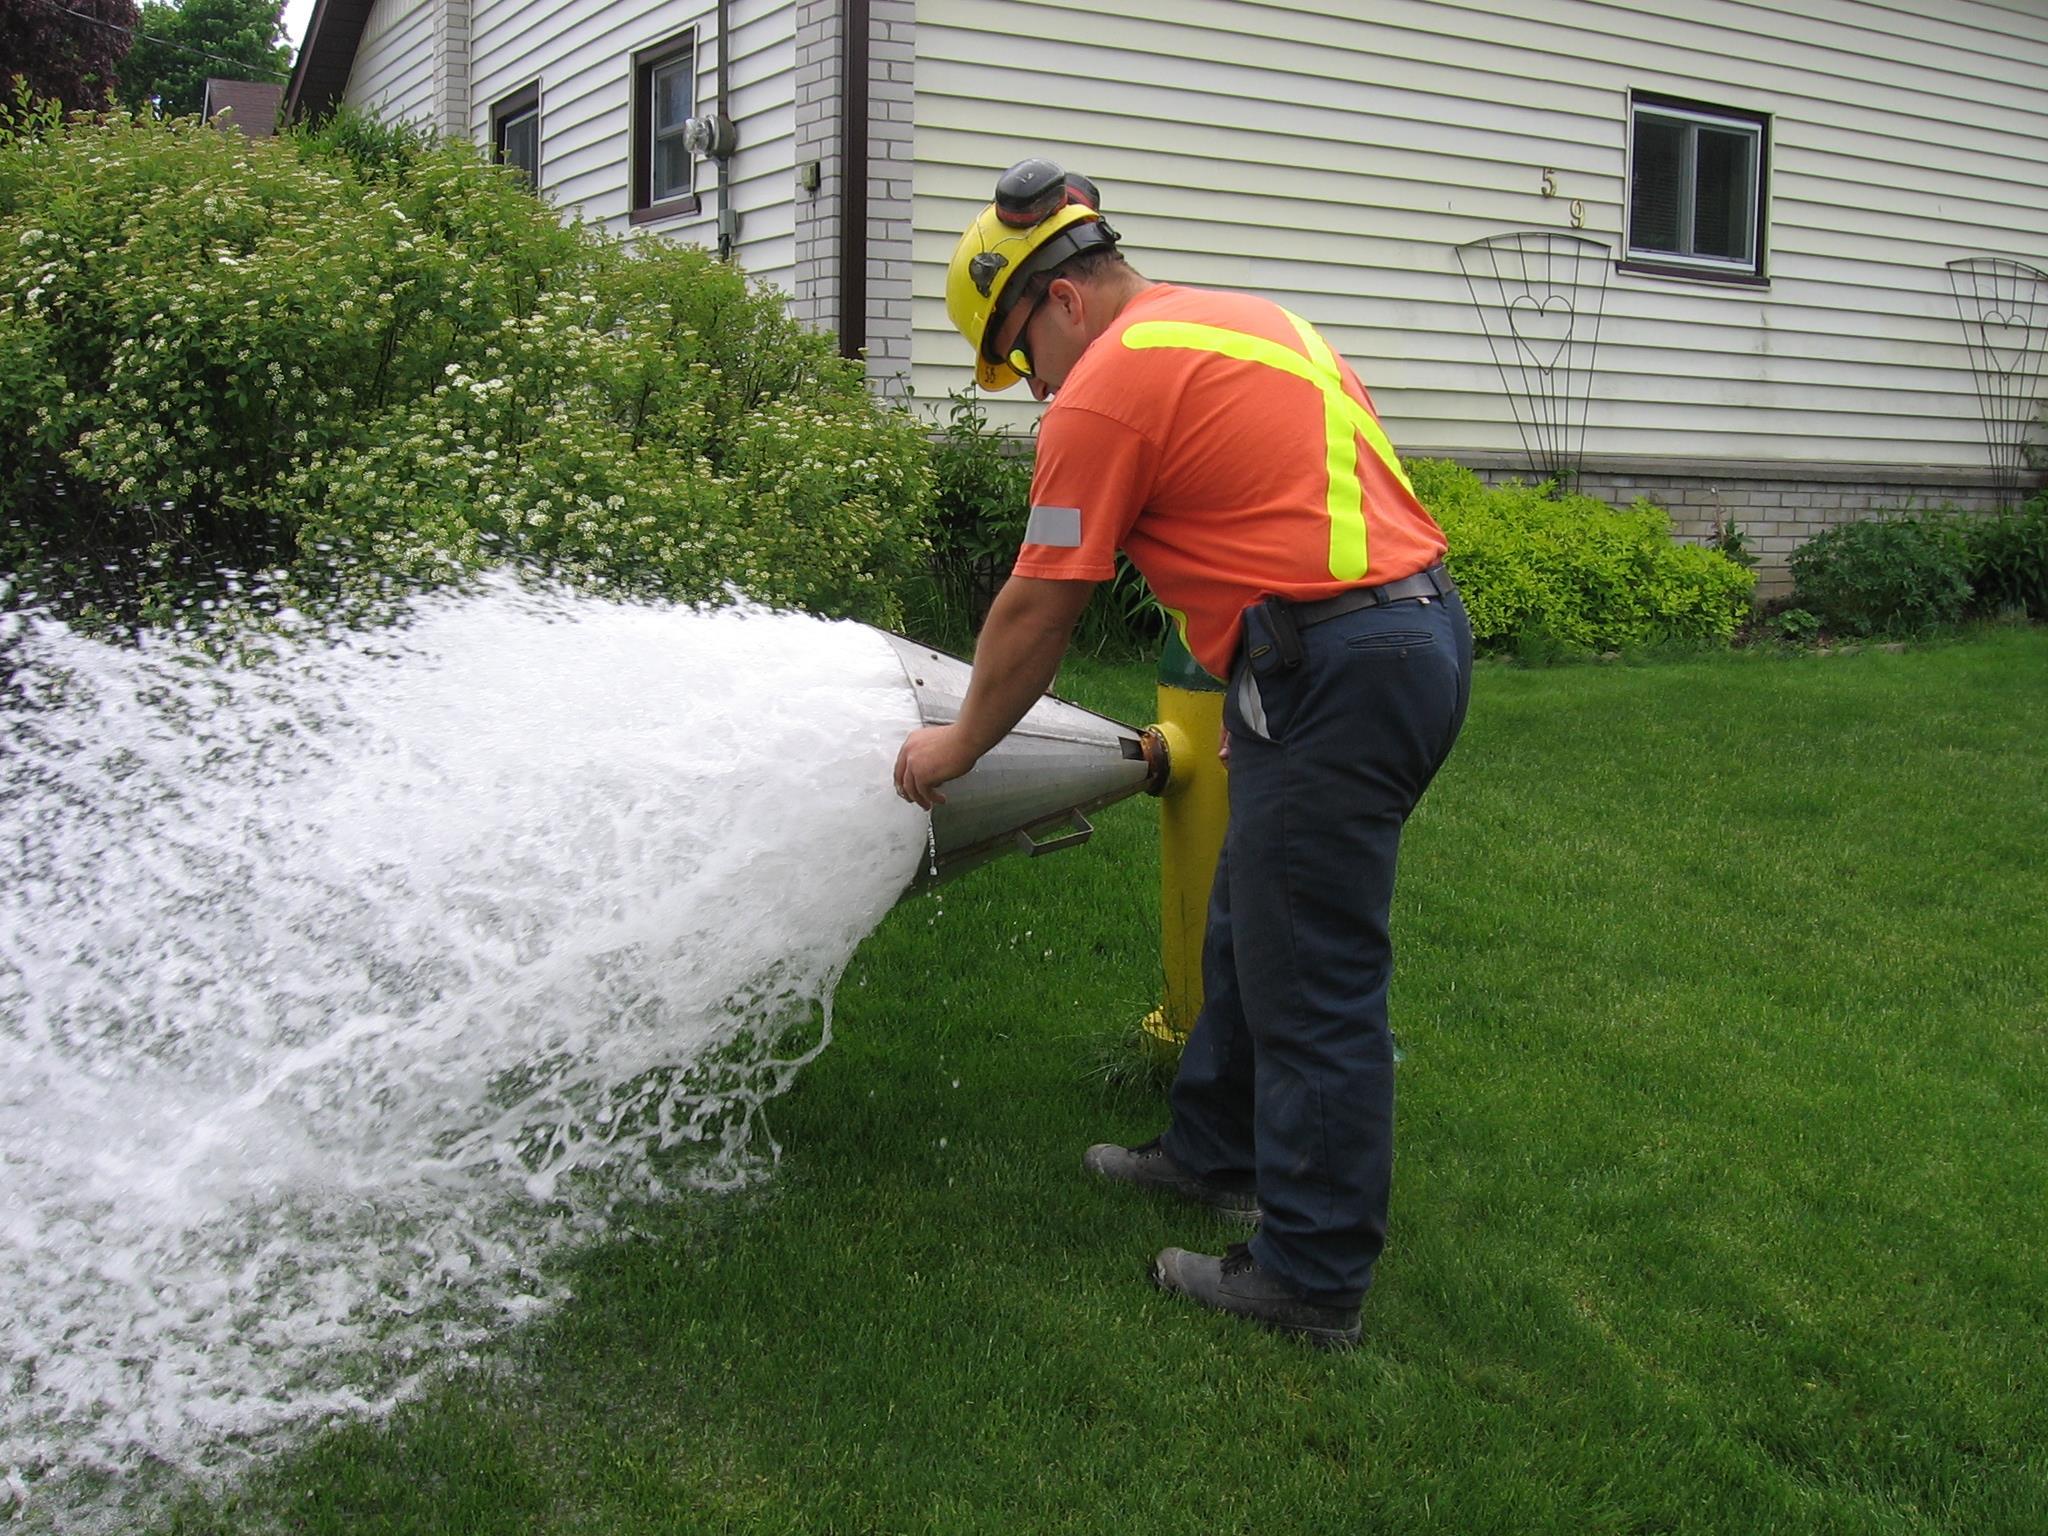 City worker flushing a watermain